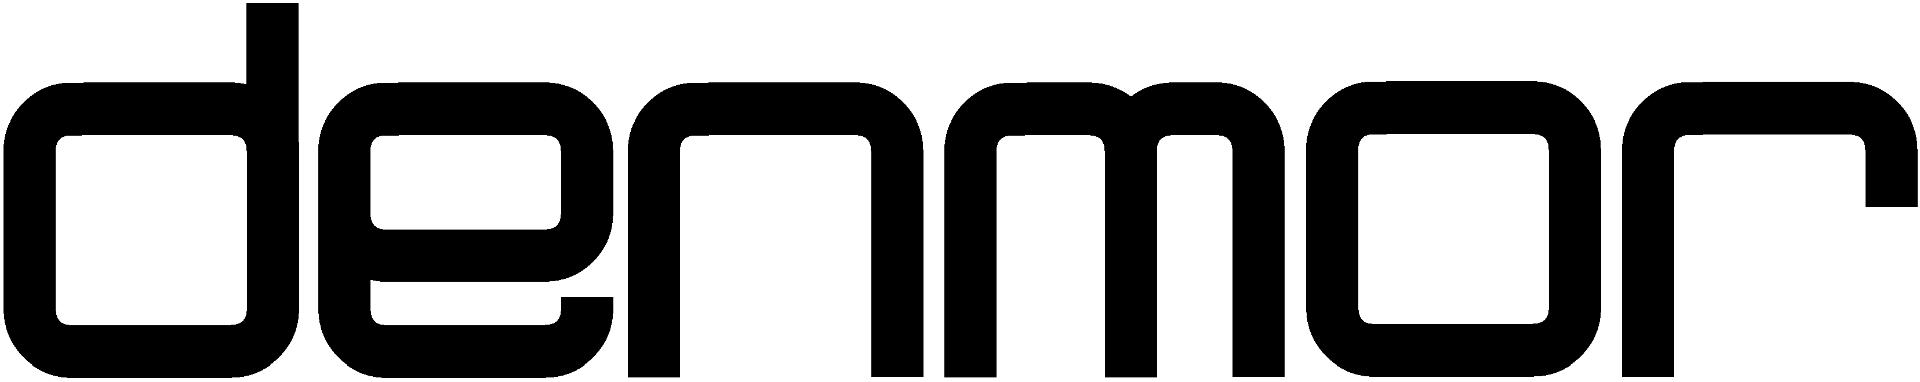 Denmor Automotive Services